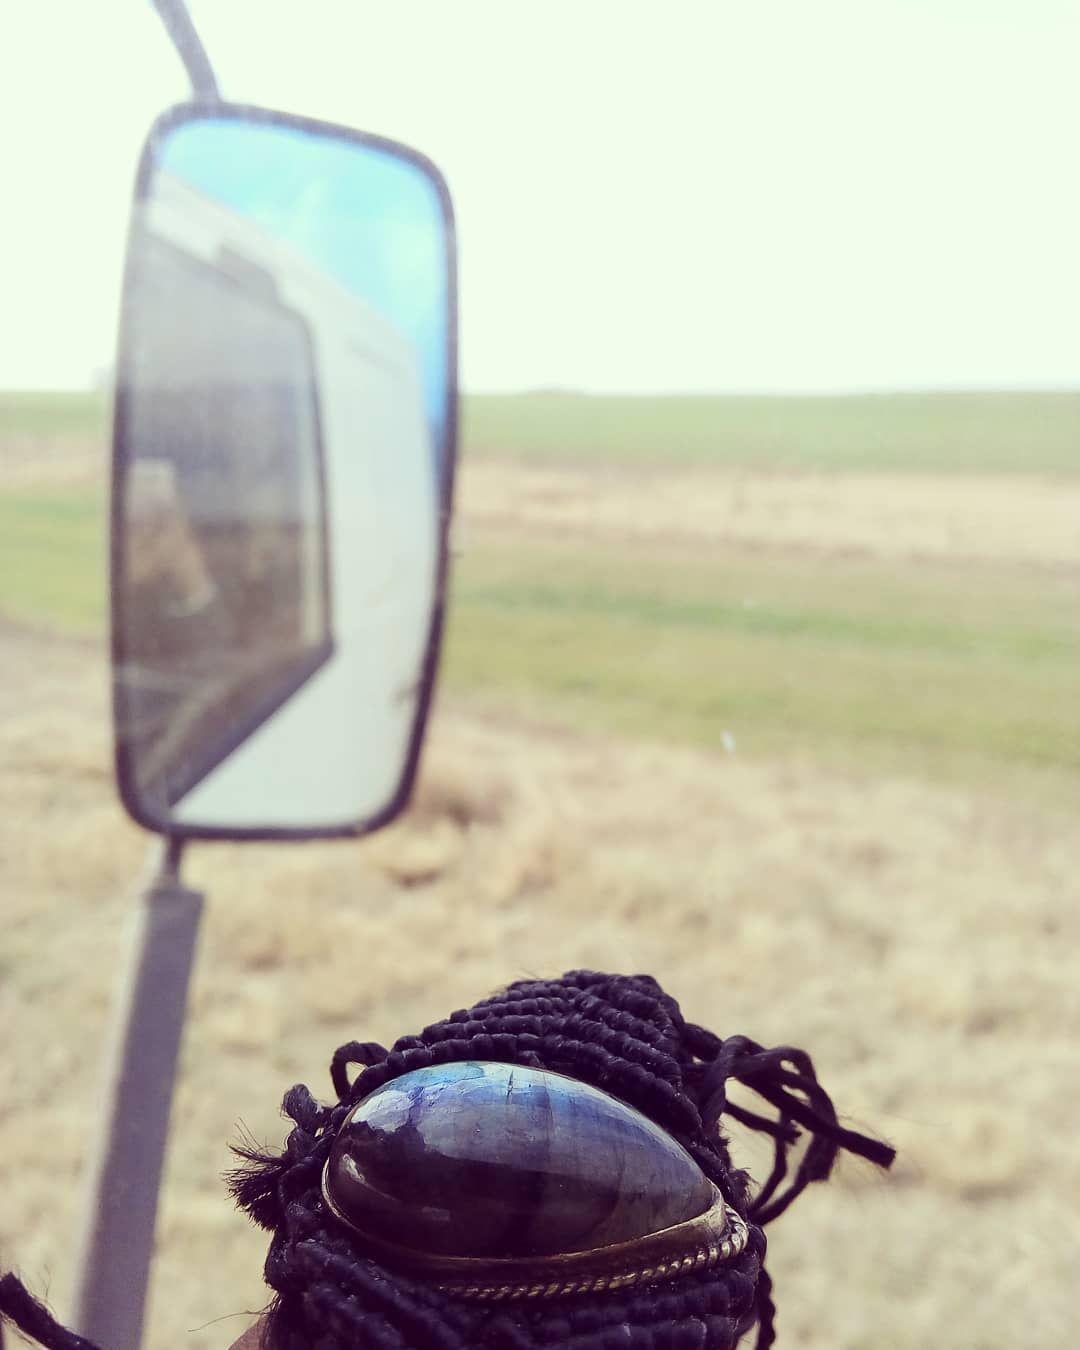 #healingstones #magichaciendo #beauty#style #hitchhiking #hitchhiking #alternative #hippiestyle #argentinas #magiagems #enjoylife #argentine #jewellery #artesanas #adventure #adventure+25 Hitchhiking on the Argentine routes. Doing crafts in the truck. Adventure, love, magic!.Haciendo dedo en las rutas argentinas. Creando artesanas en el camin. Aventura, amor, magia!......#gems